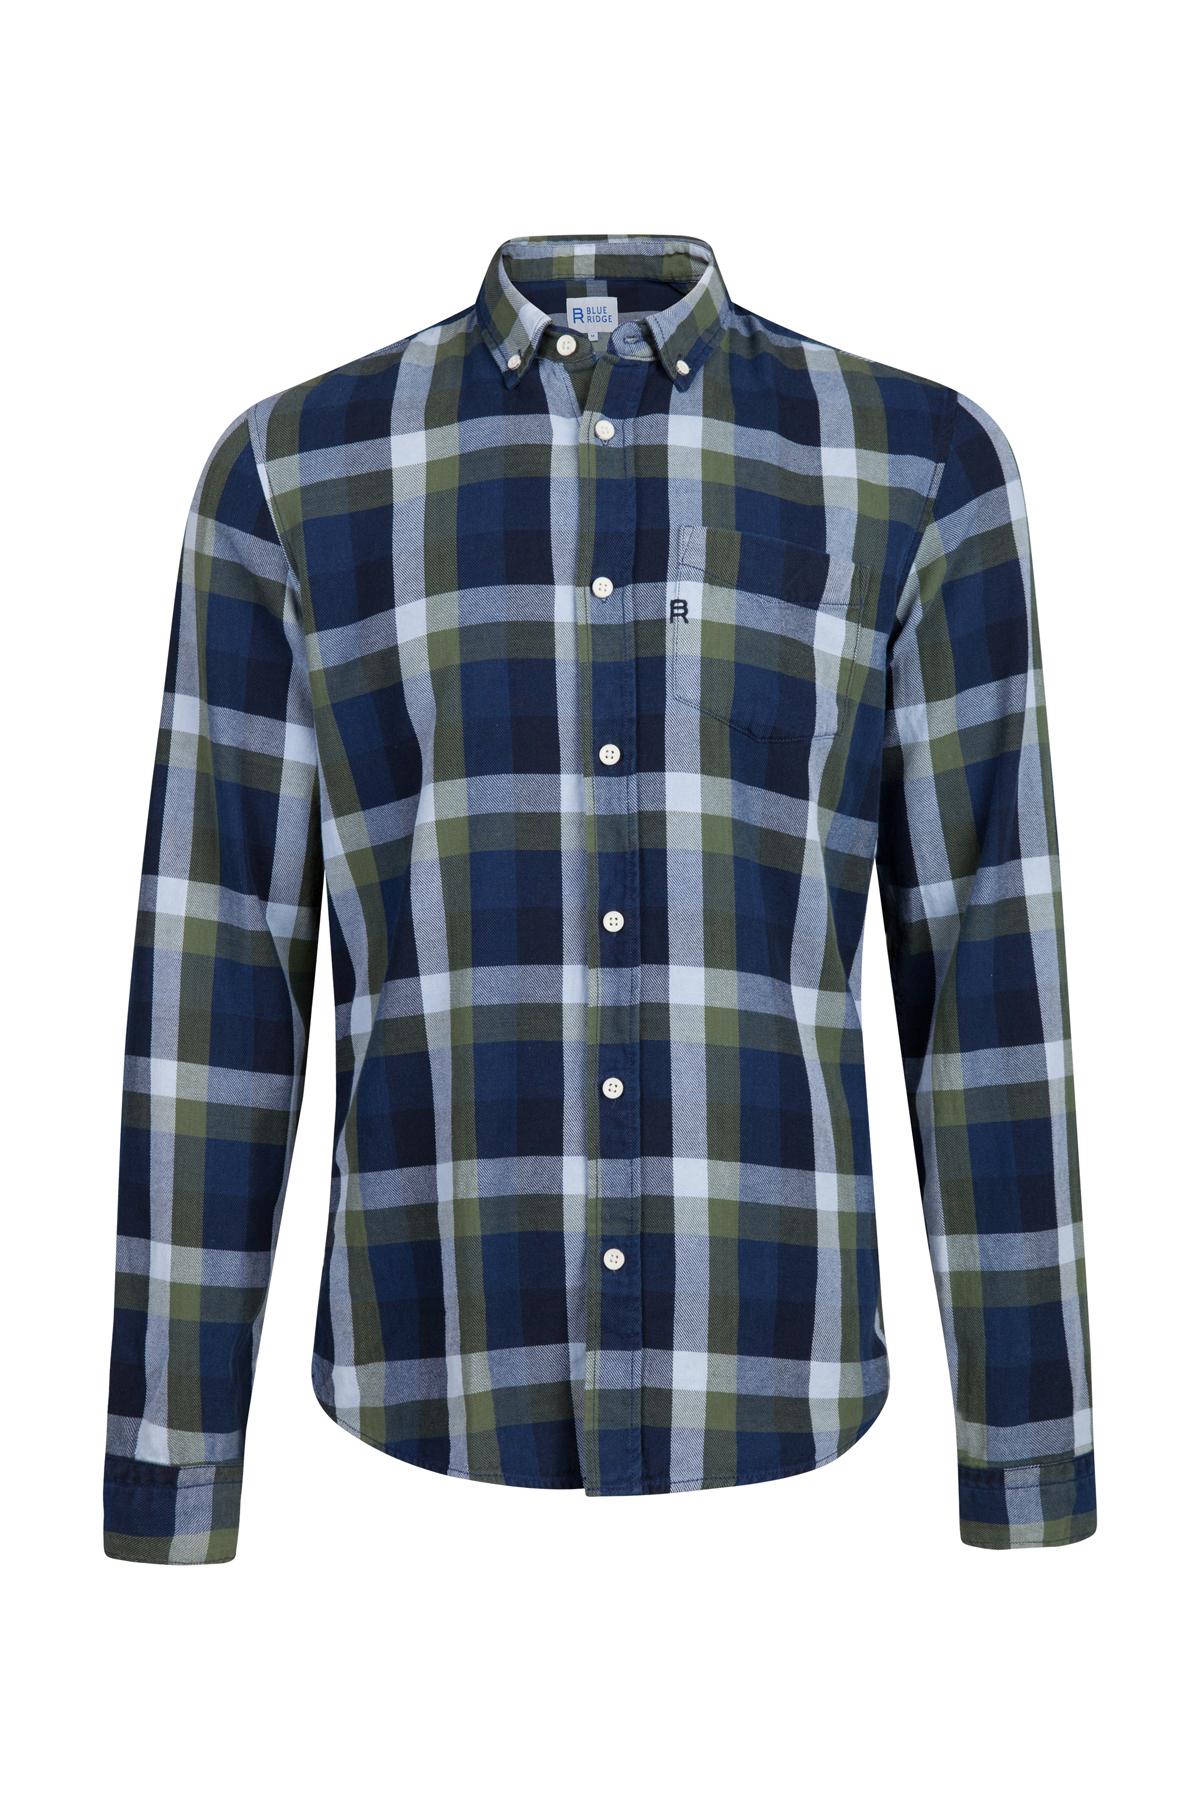 Ruiten Overhemd Heren.Heren Ruit Overhemd 94624069 We Fashion